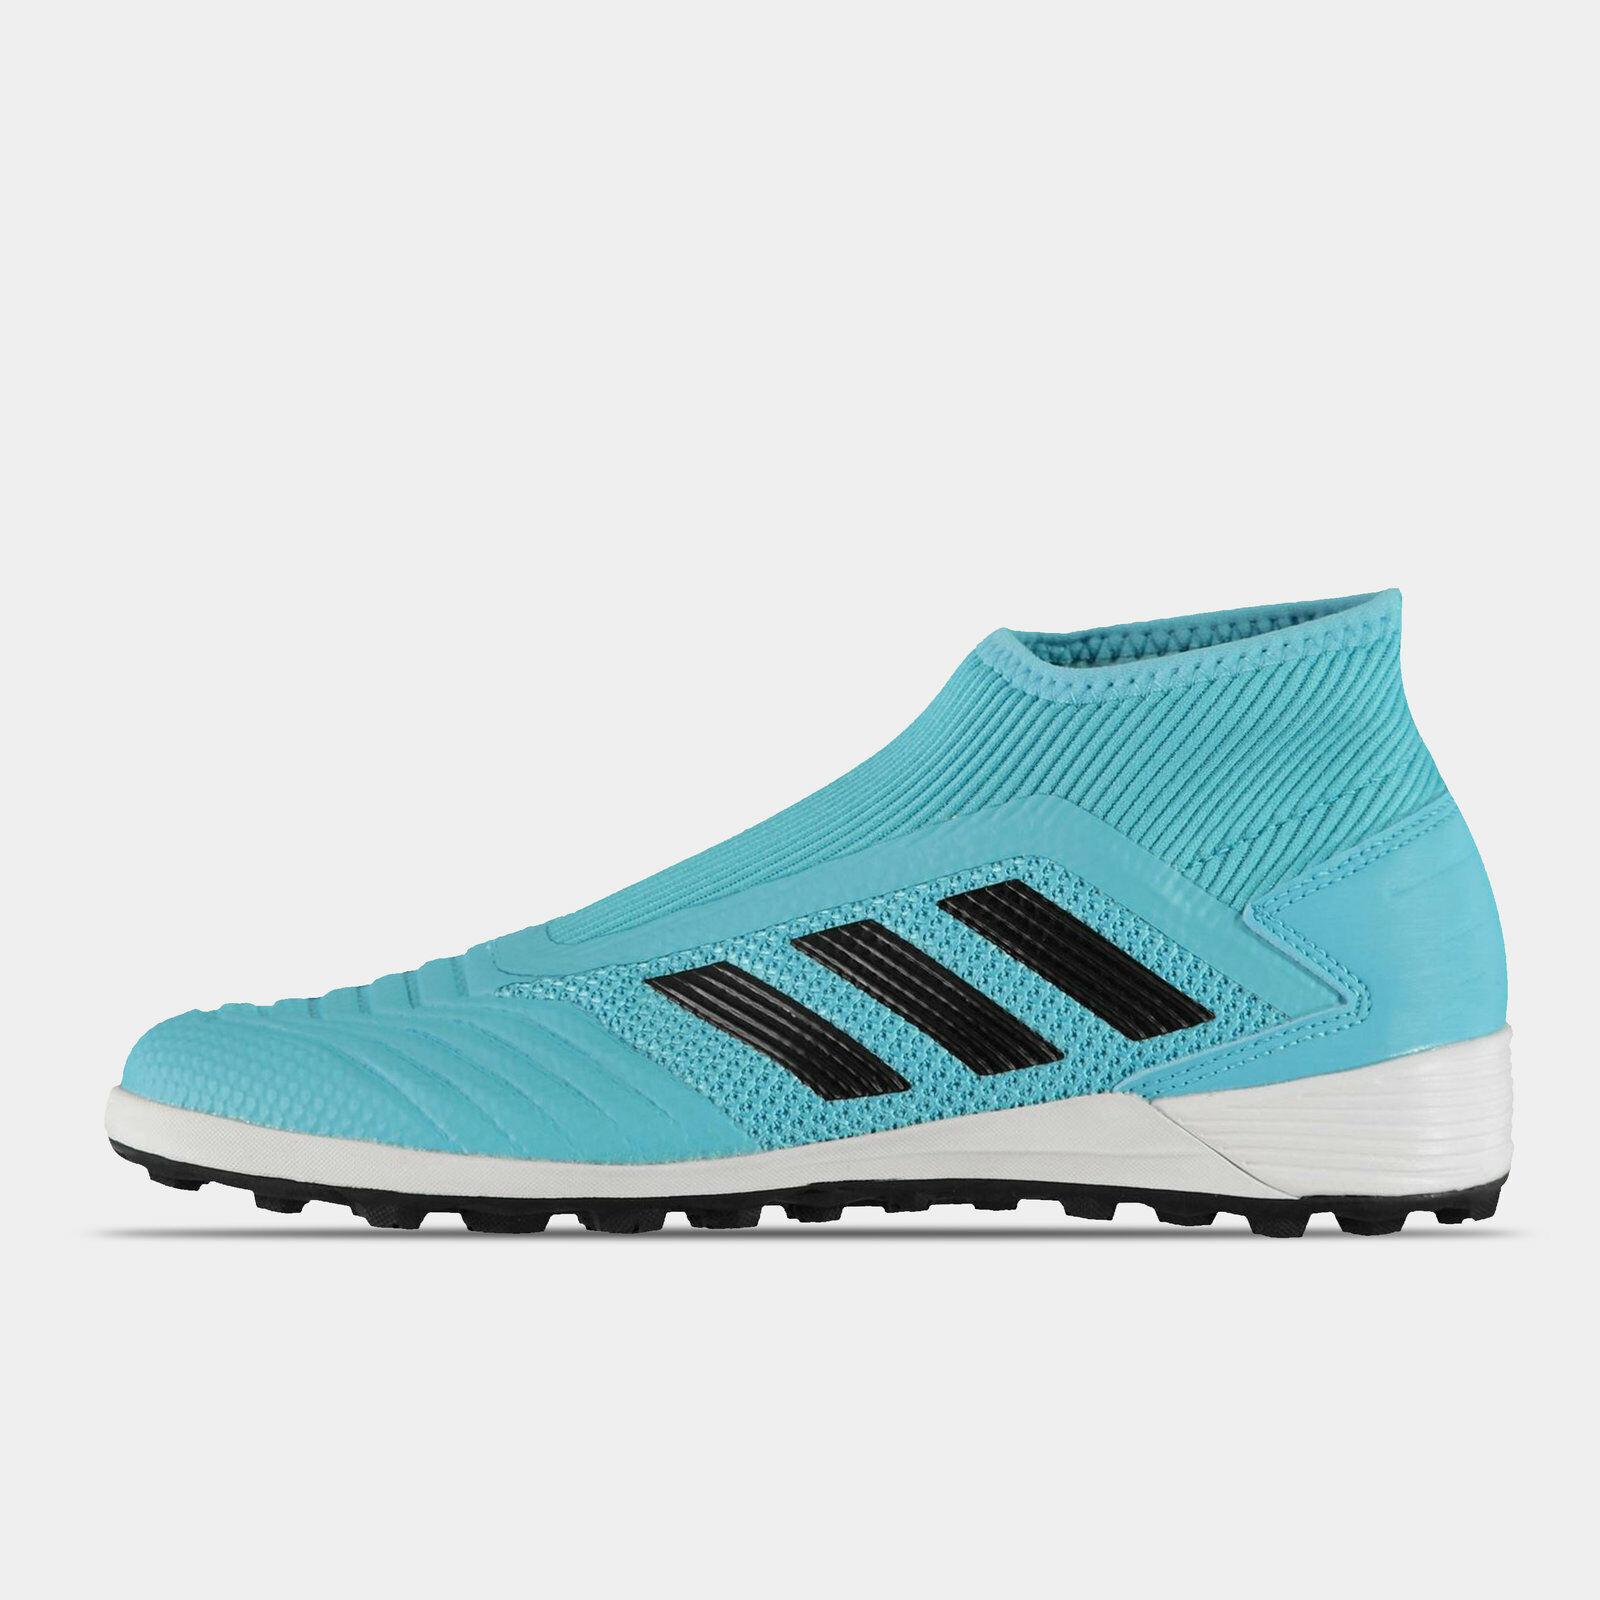 Adidas para hombre Deprojoador 19.3 rodean Astro Turf Entrenadores Zapatos Deportivos